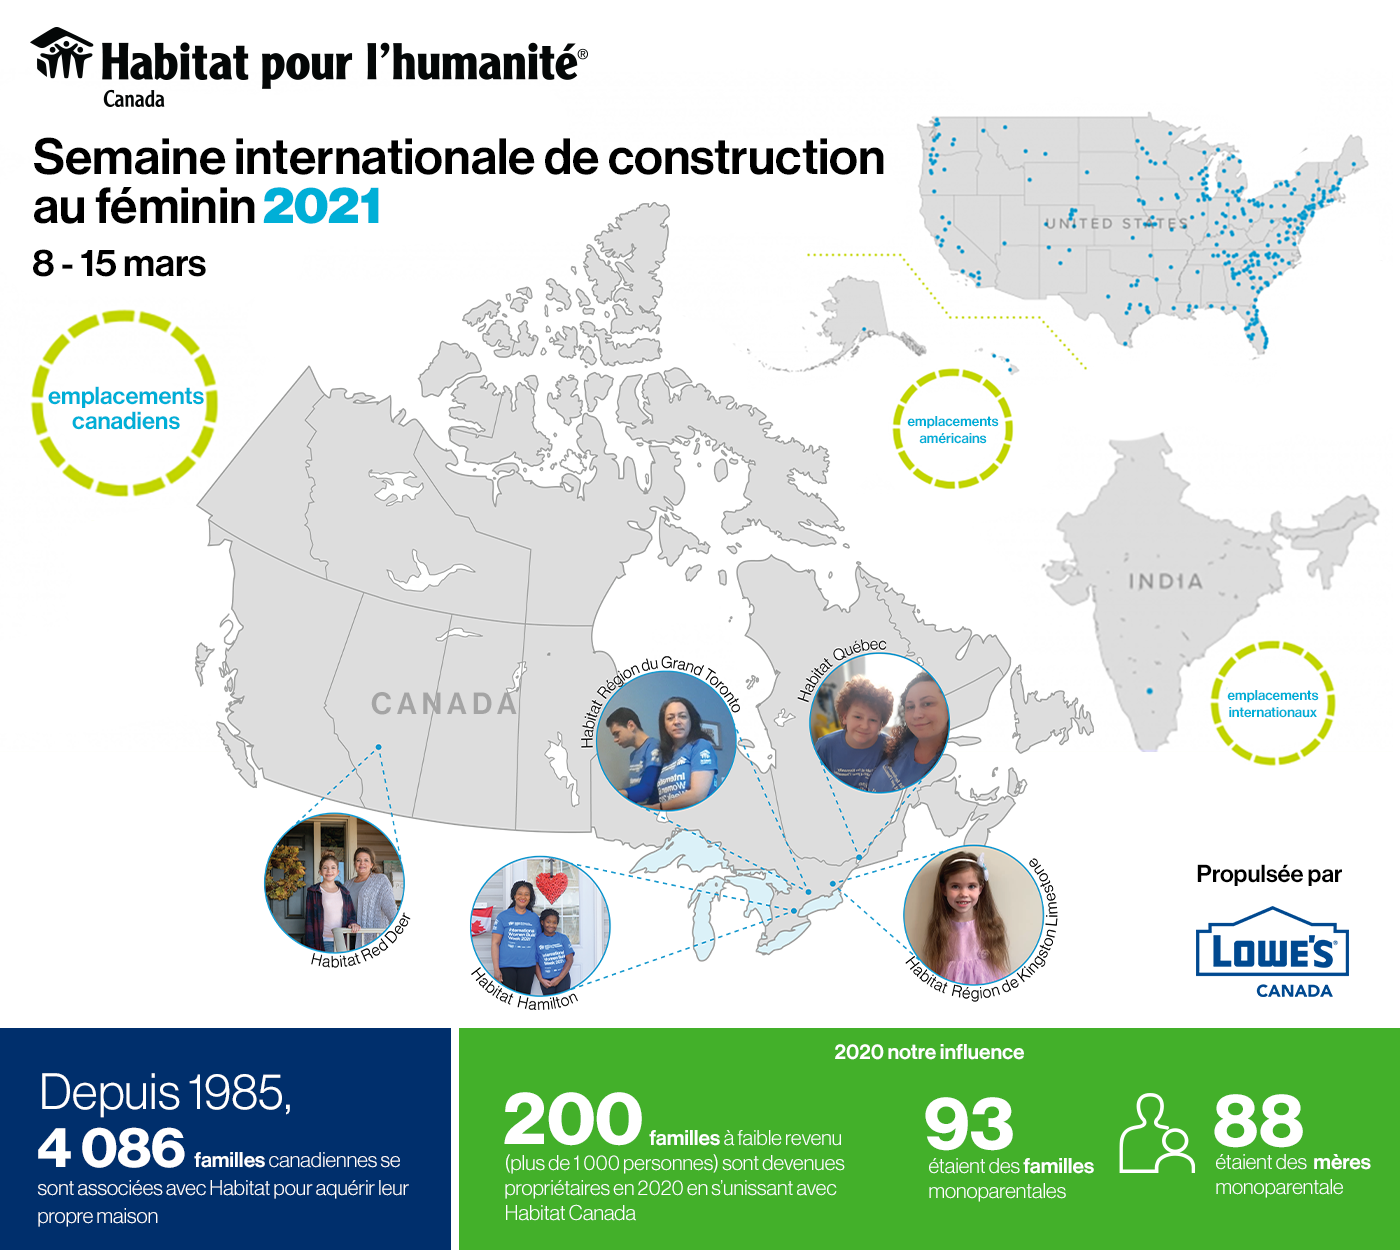 Semaine internationale de construction au féminin 2021